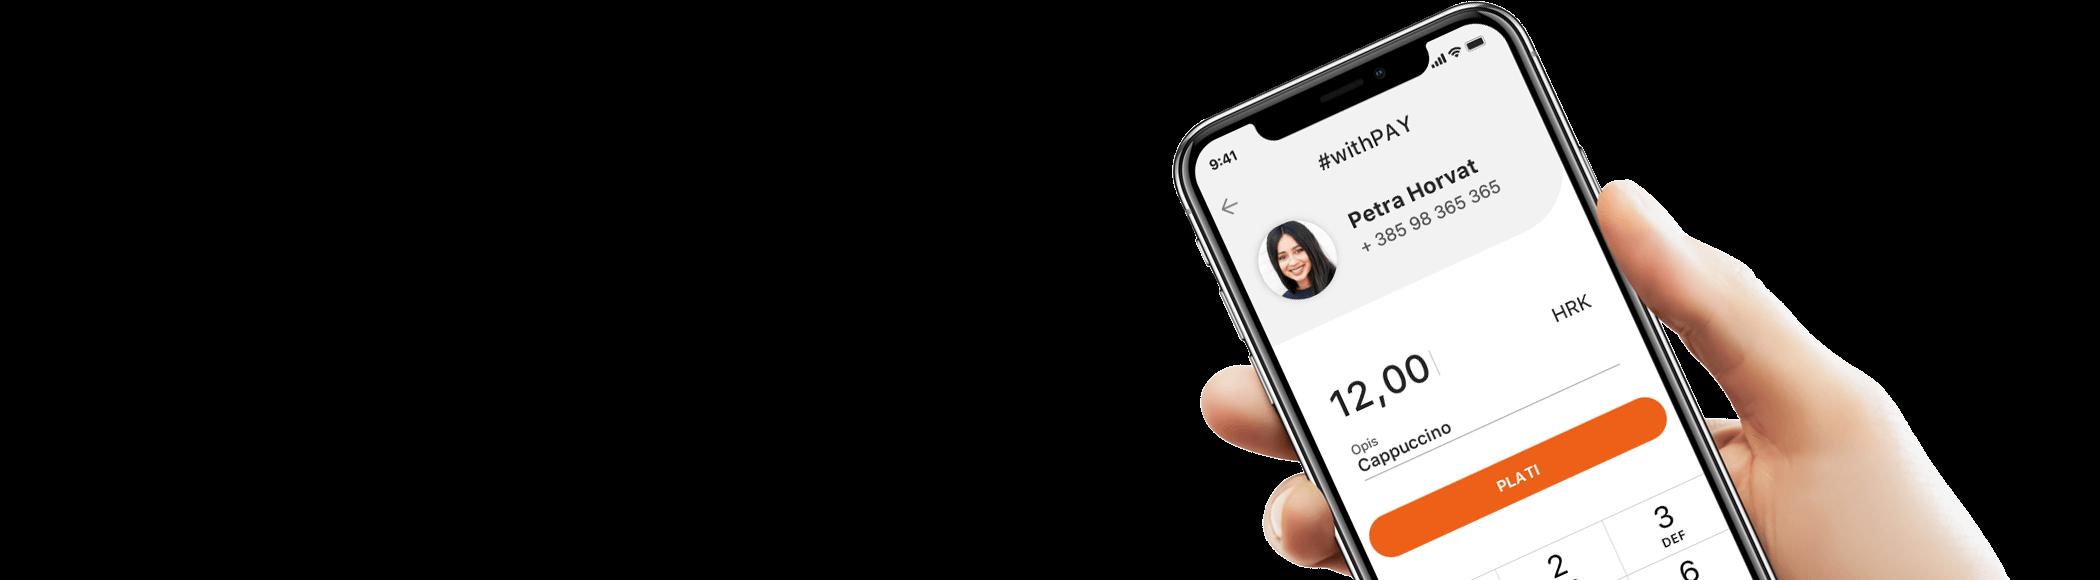 PBZ mobile banking